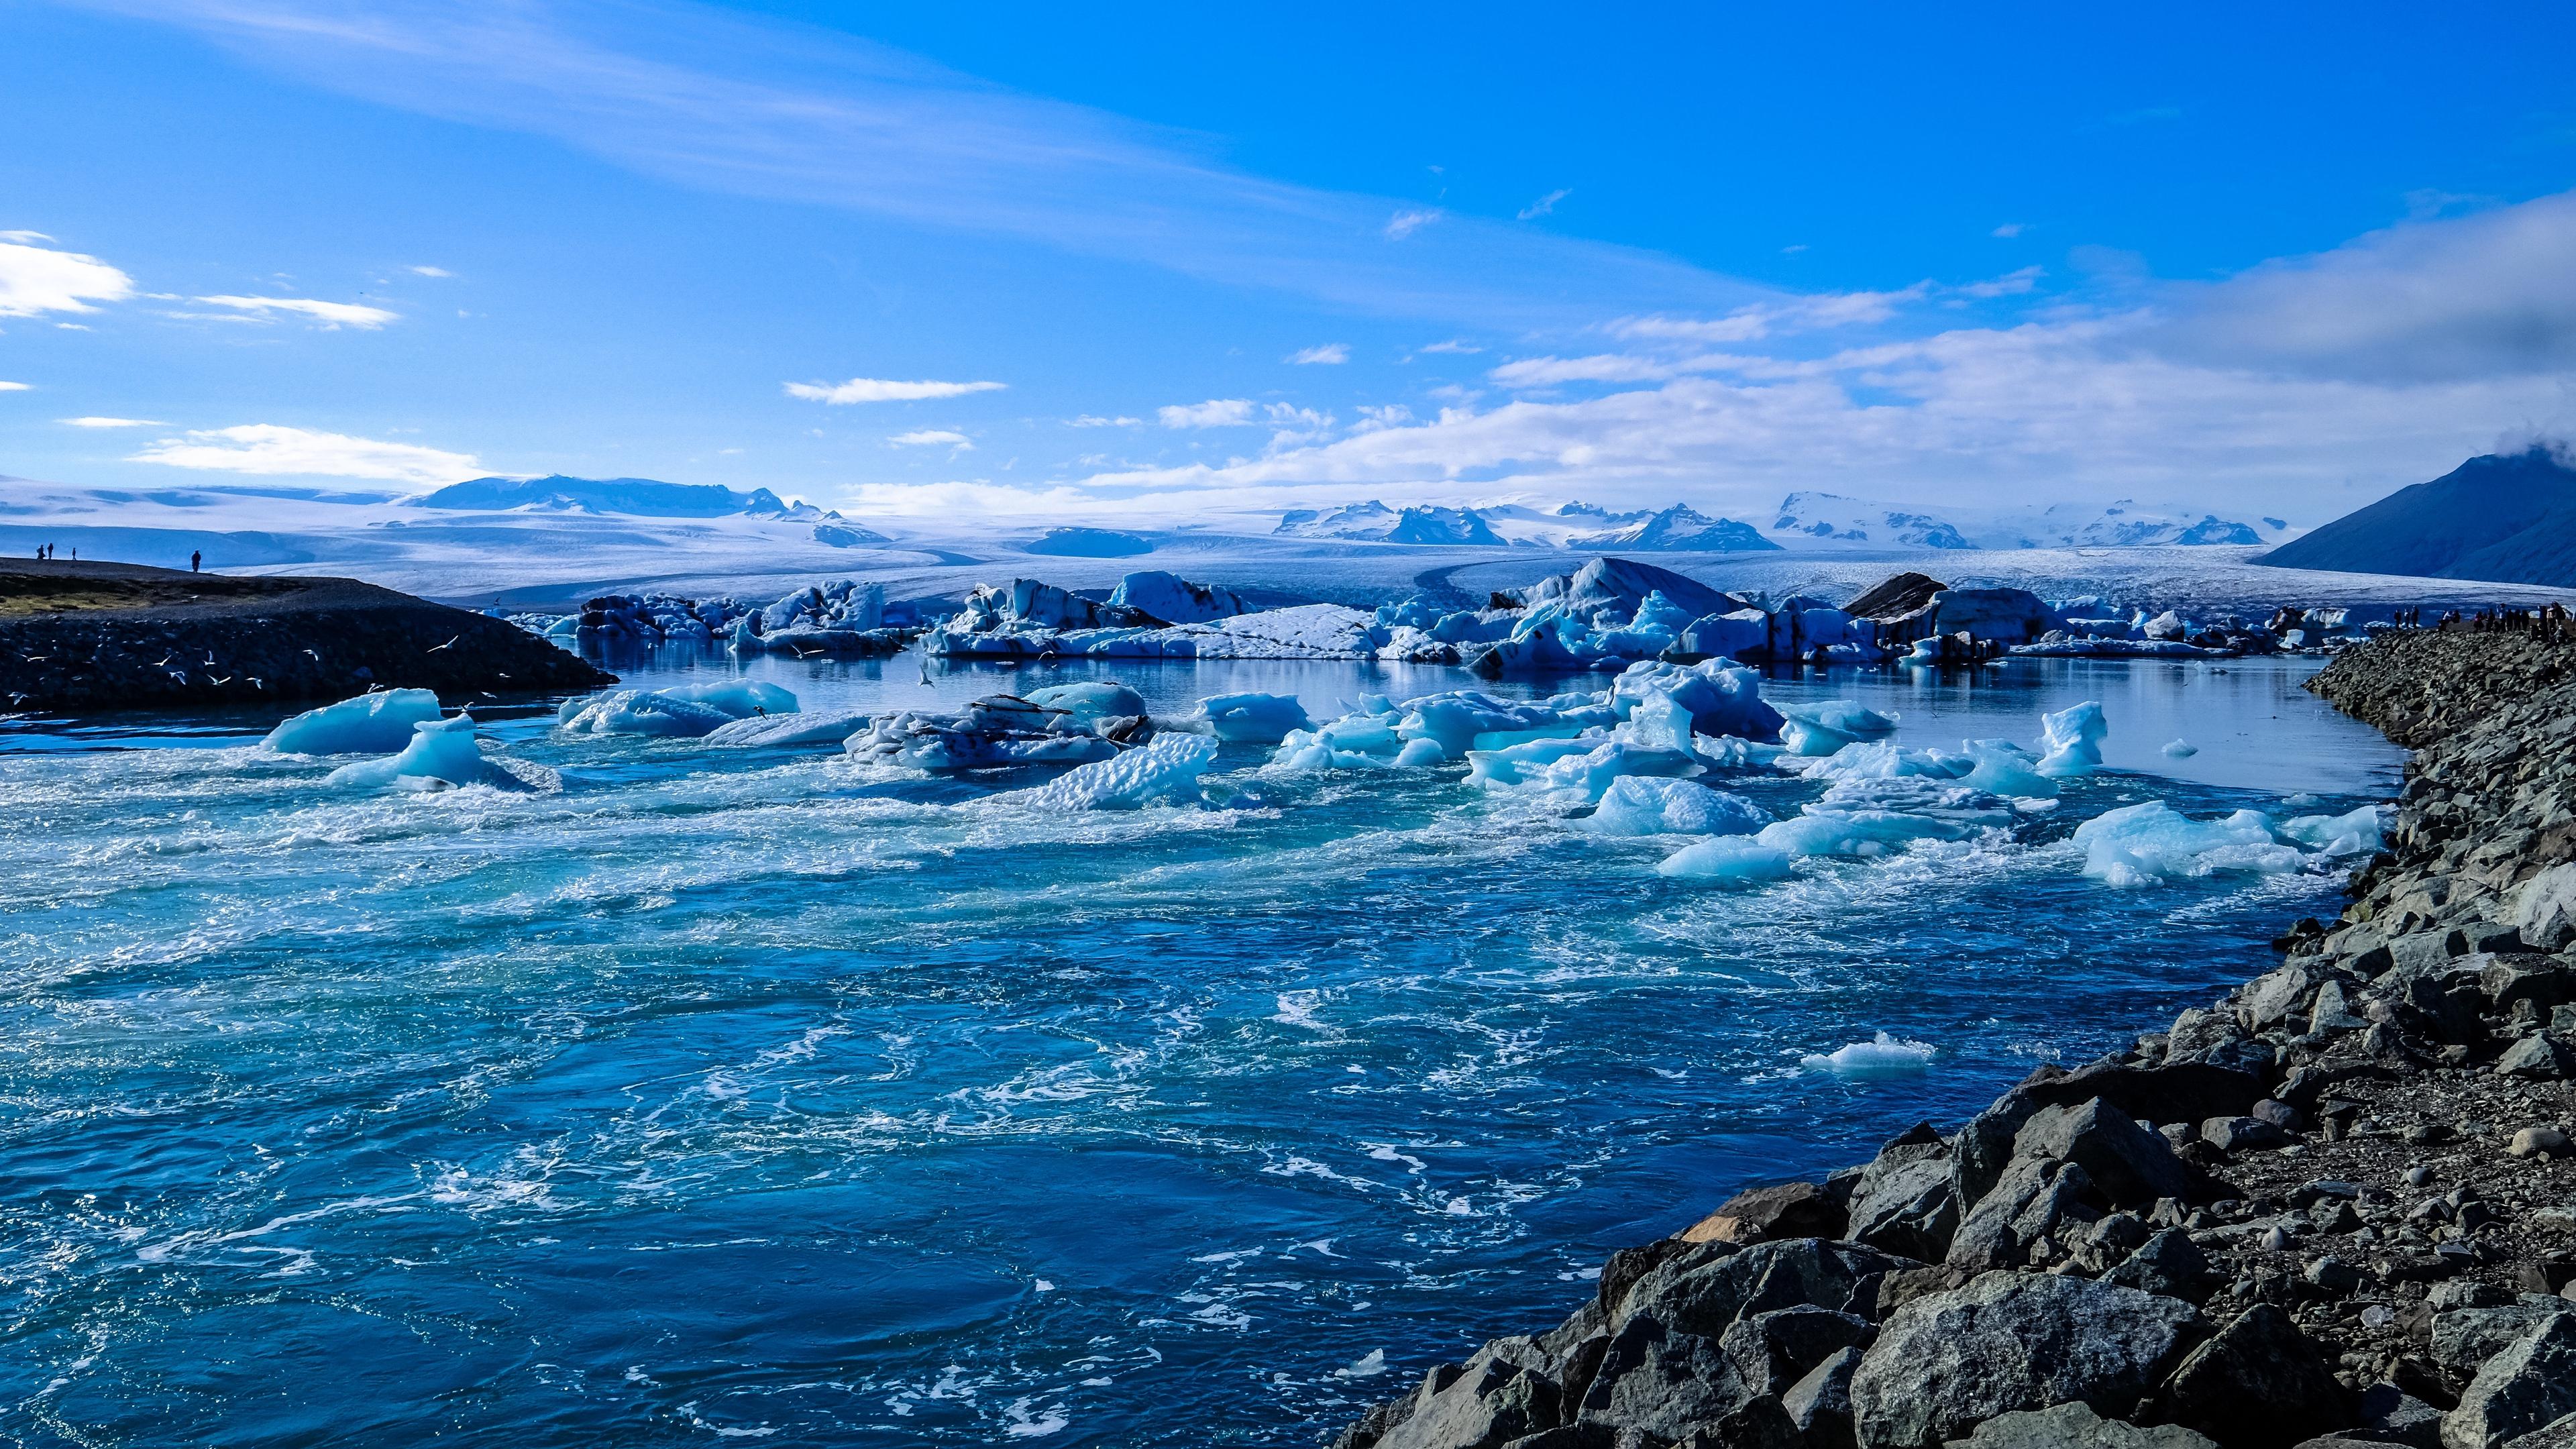 iceland ice ocean shore 4k 1541117790 - iceland, ice, ocean, shore 4k - Ocean, Iceland, Ice